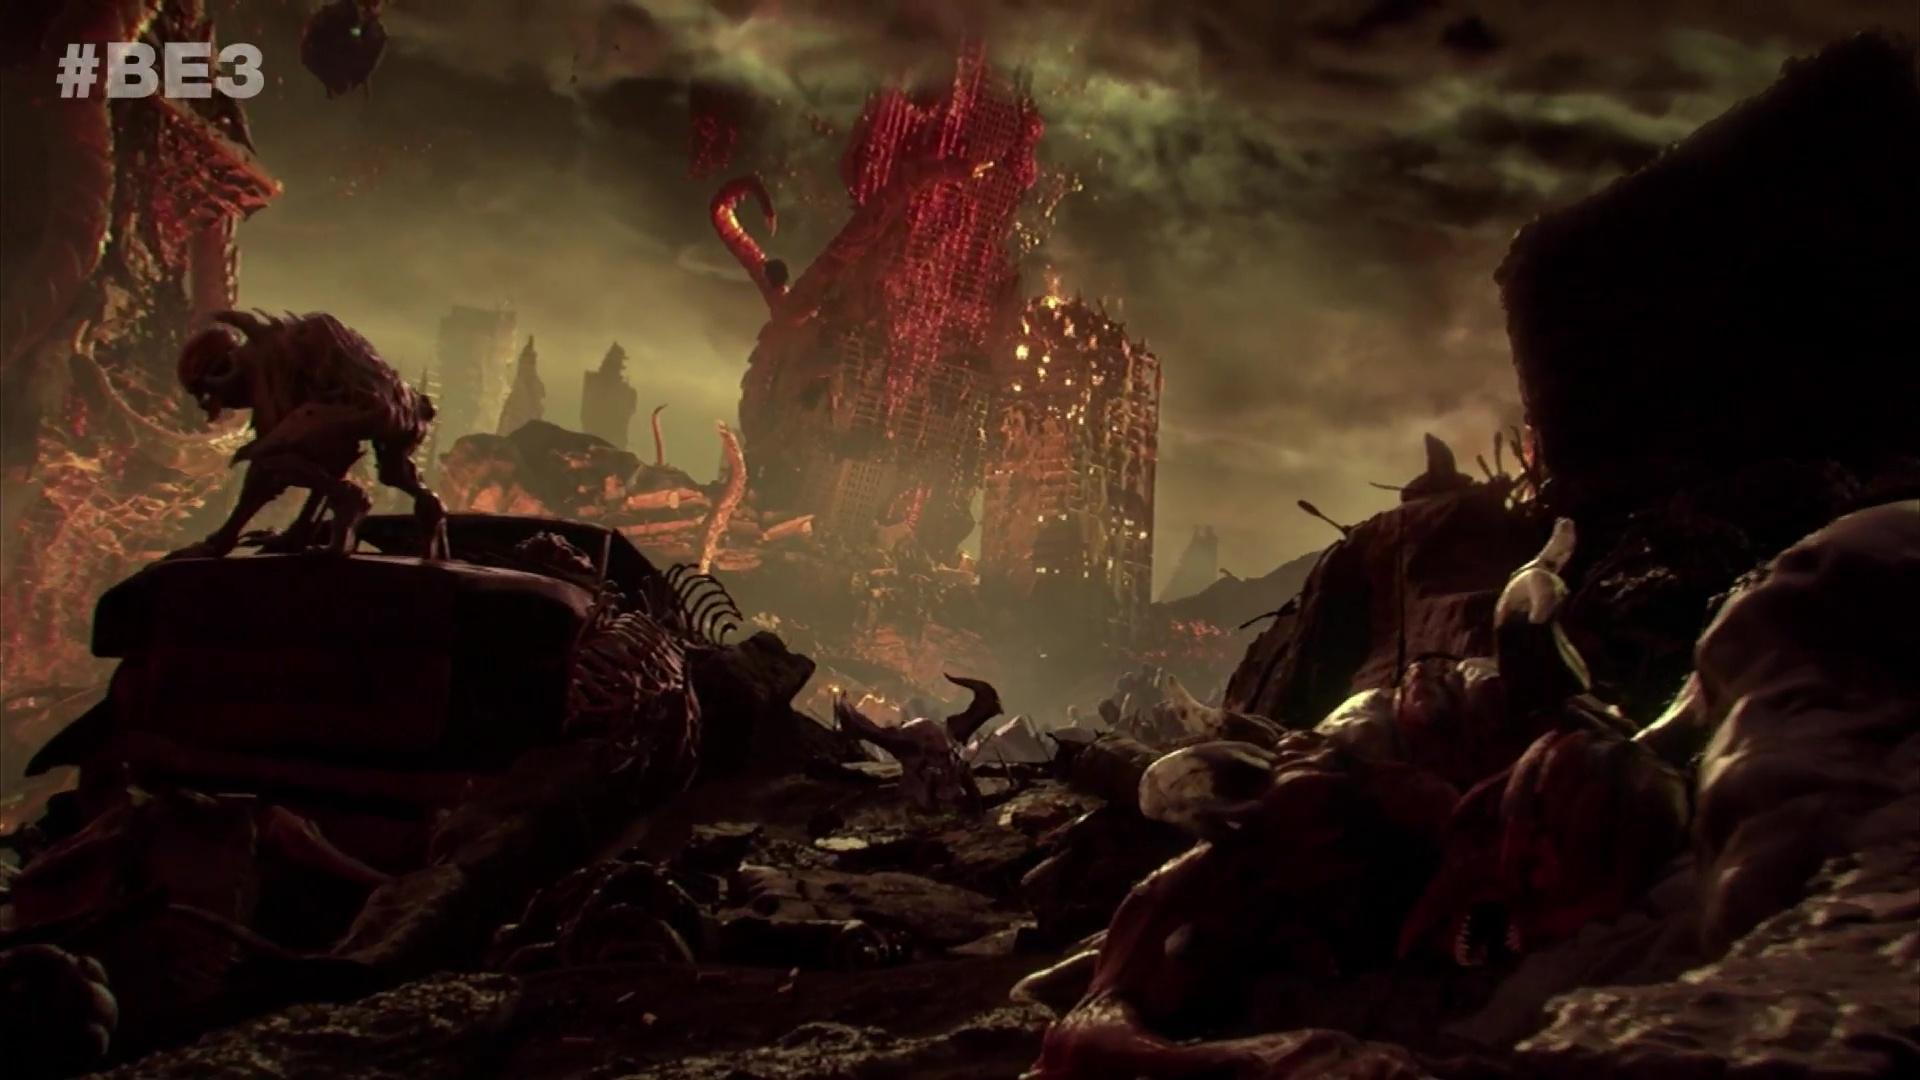 Doom Eternal announced with fiery trailer - Polygon